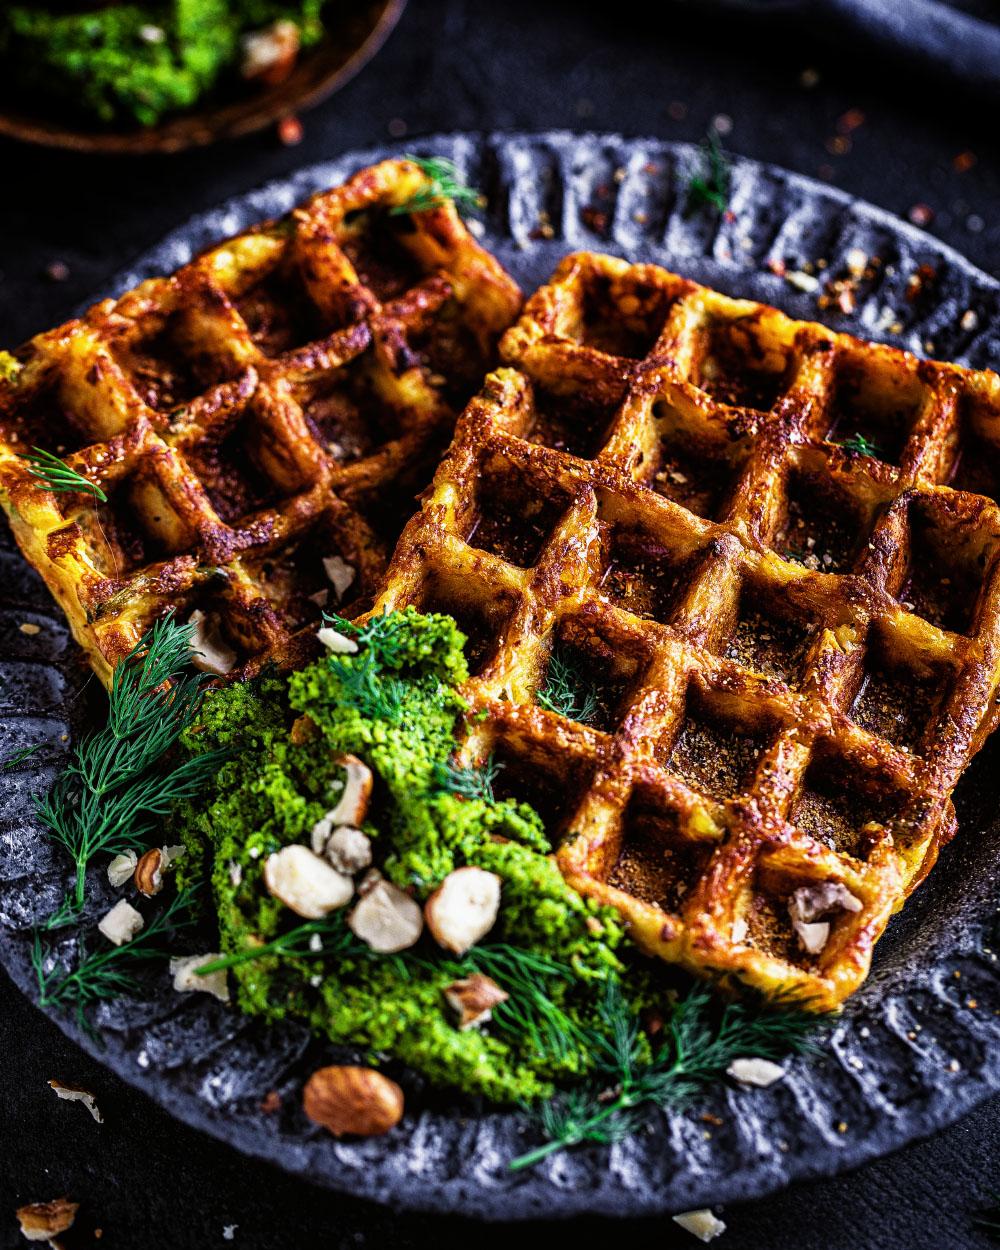 Kartoffel-Käse-Waffeln mit Dill-Haselnuss-Pesto einfaches rezept schnell resteessen Kartoffelpüree